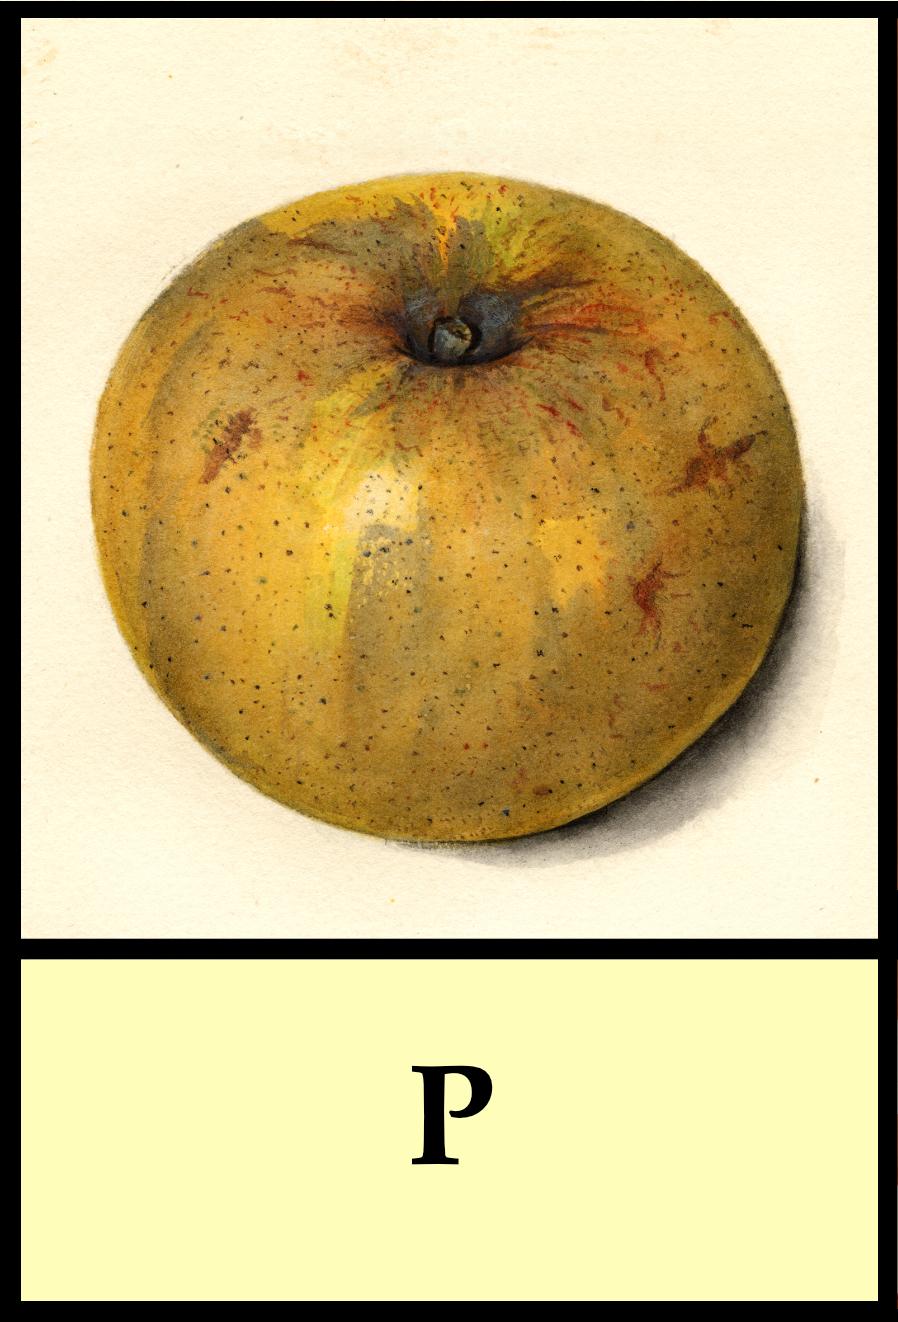 P apples